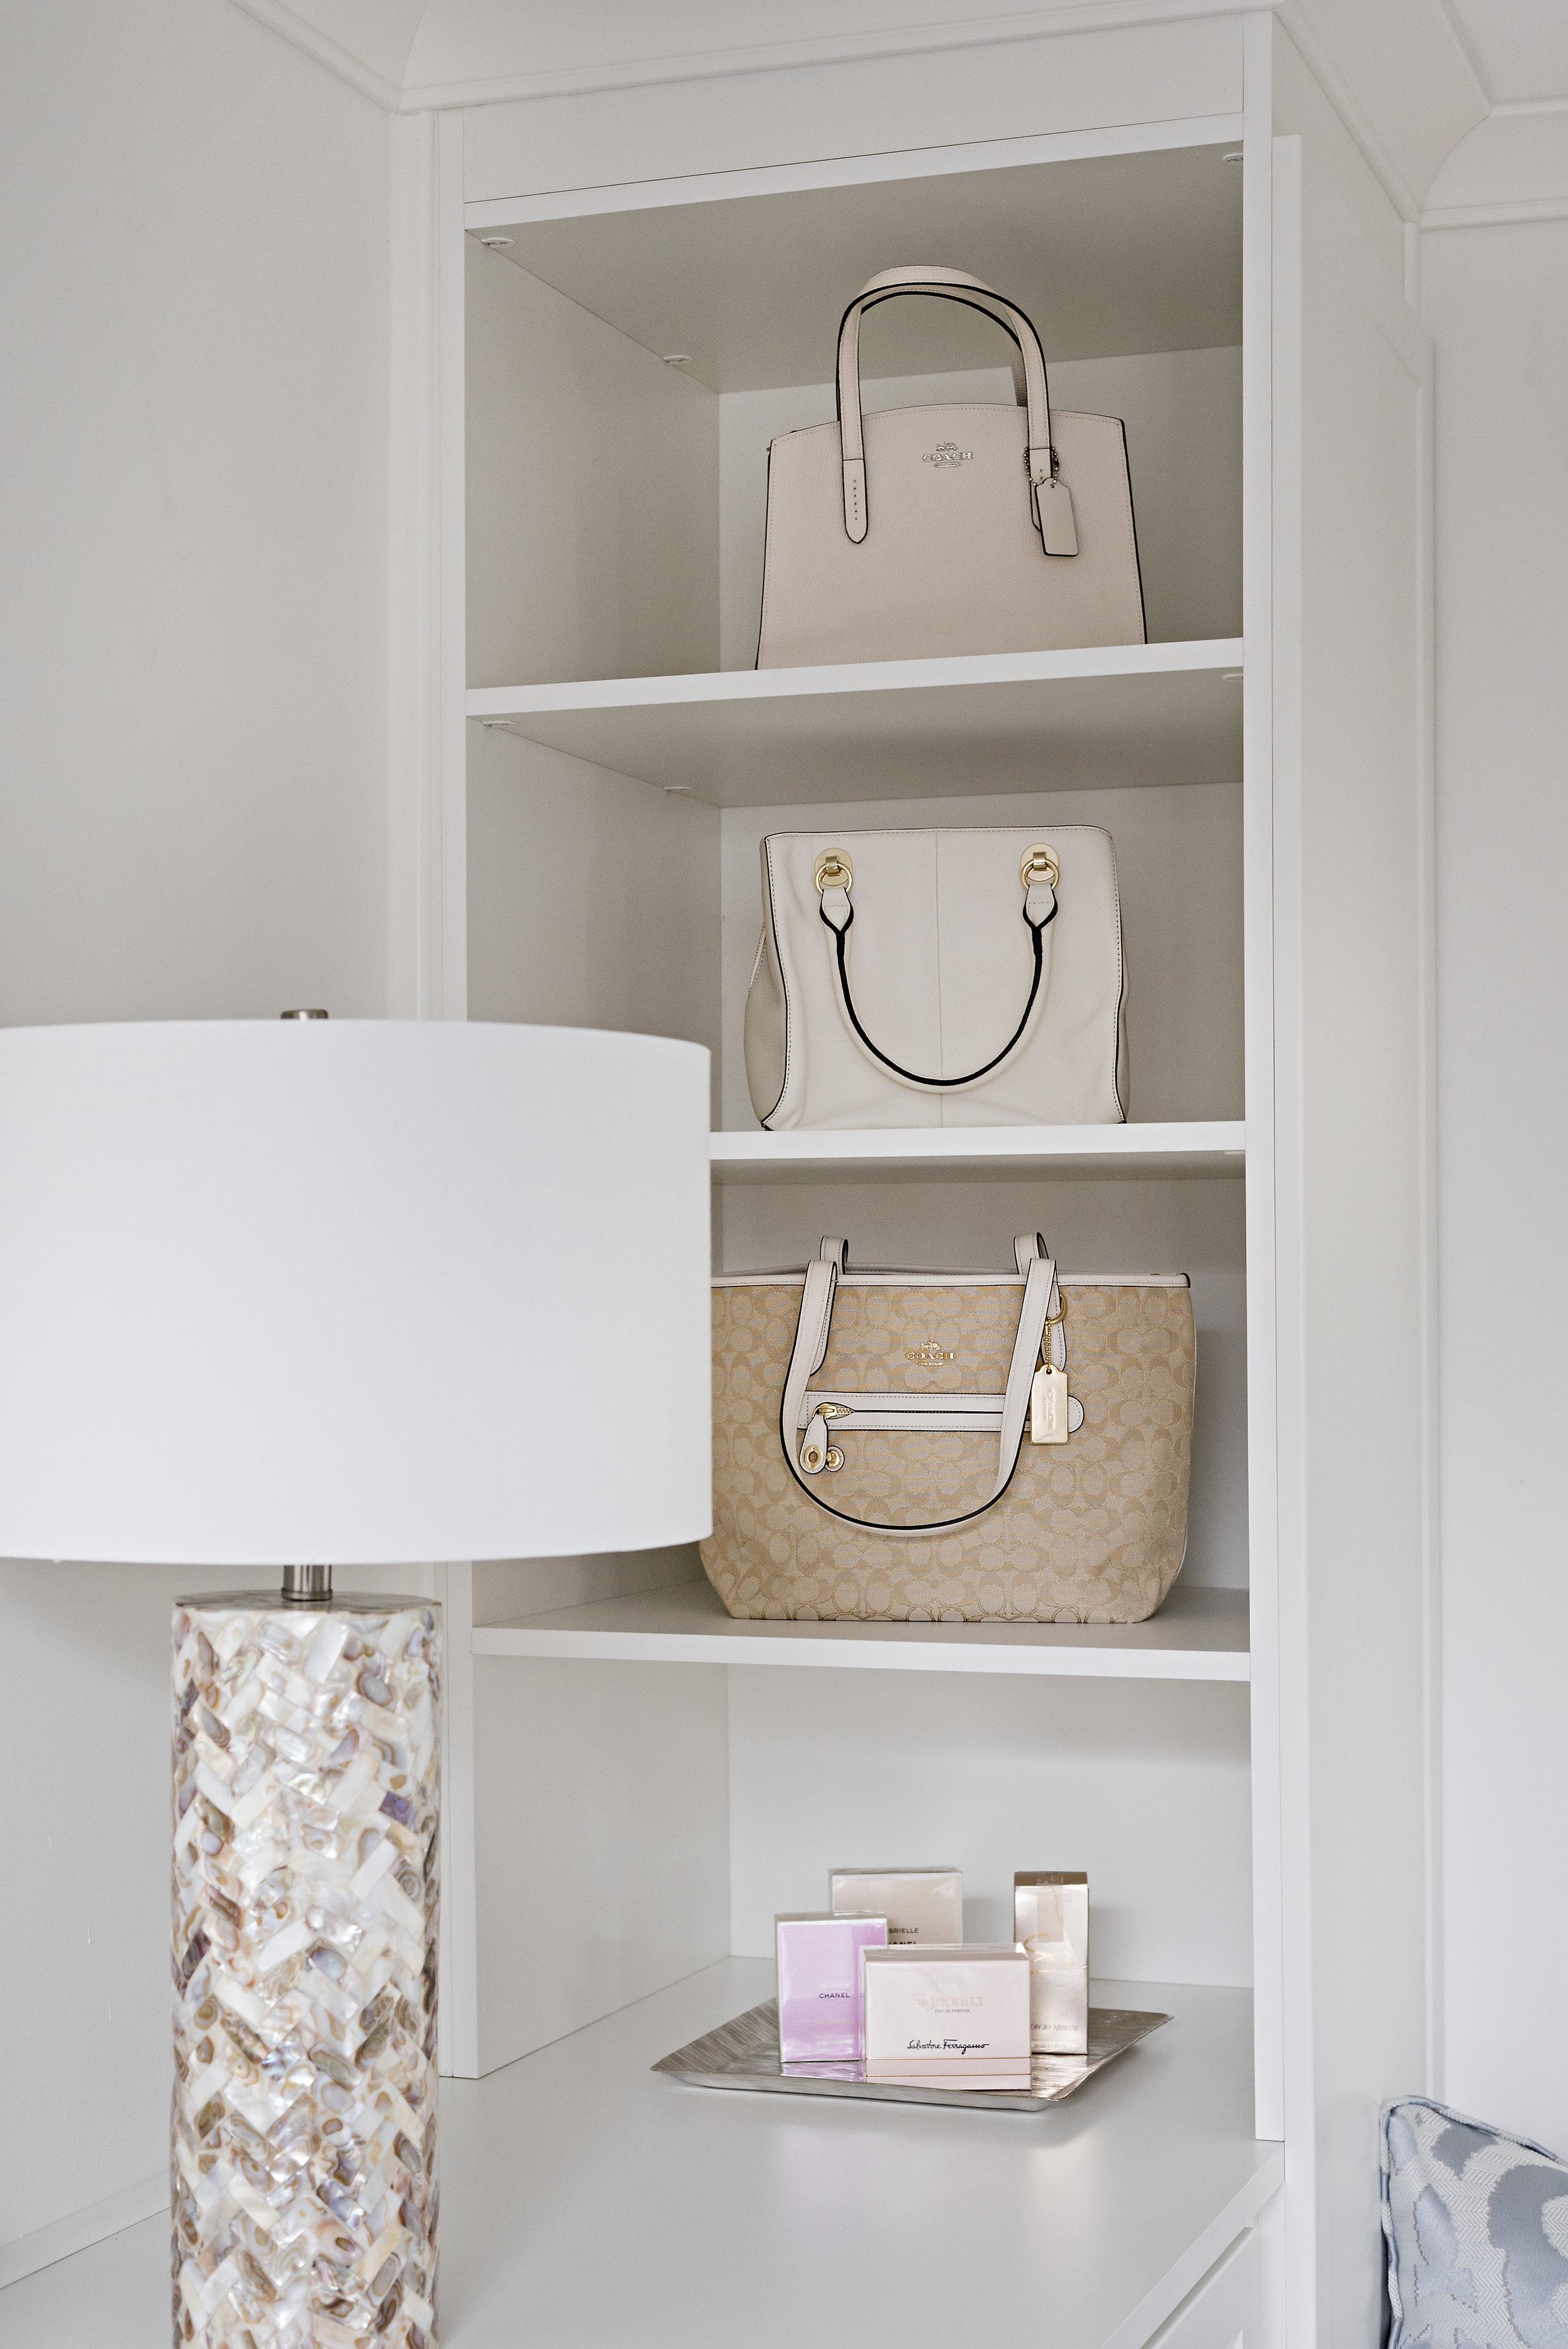 pizzale design interior design decorarion closet organization purse display storage open cabinet white clean crisp simple bright.jpg